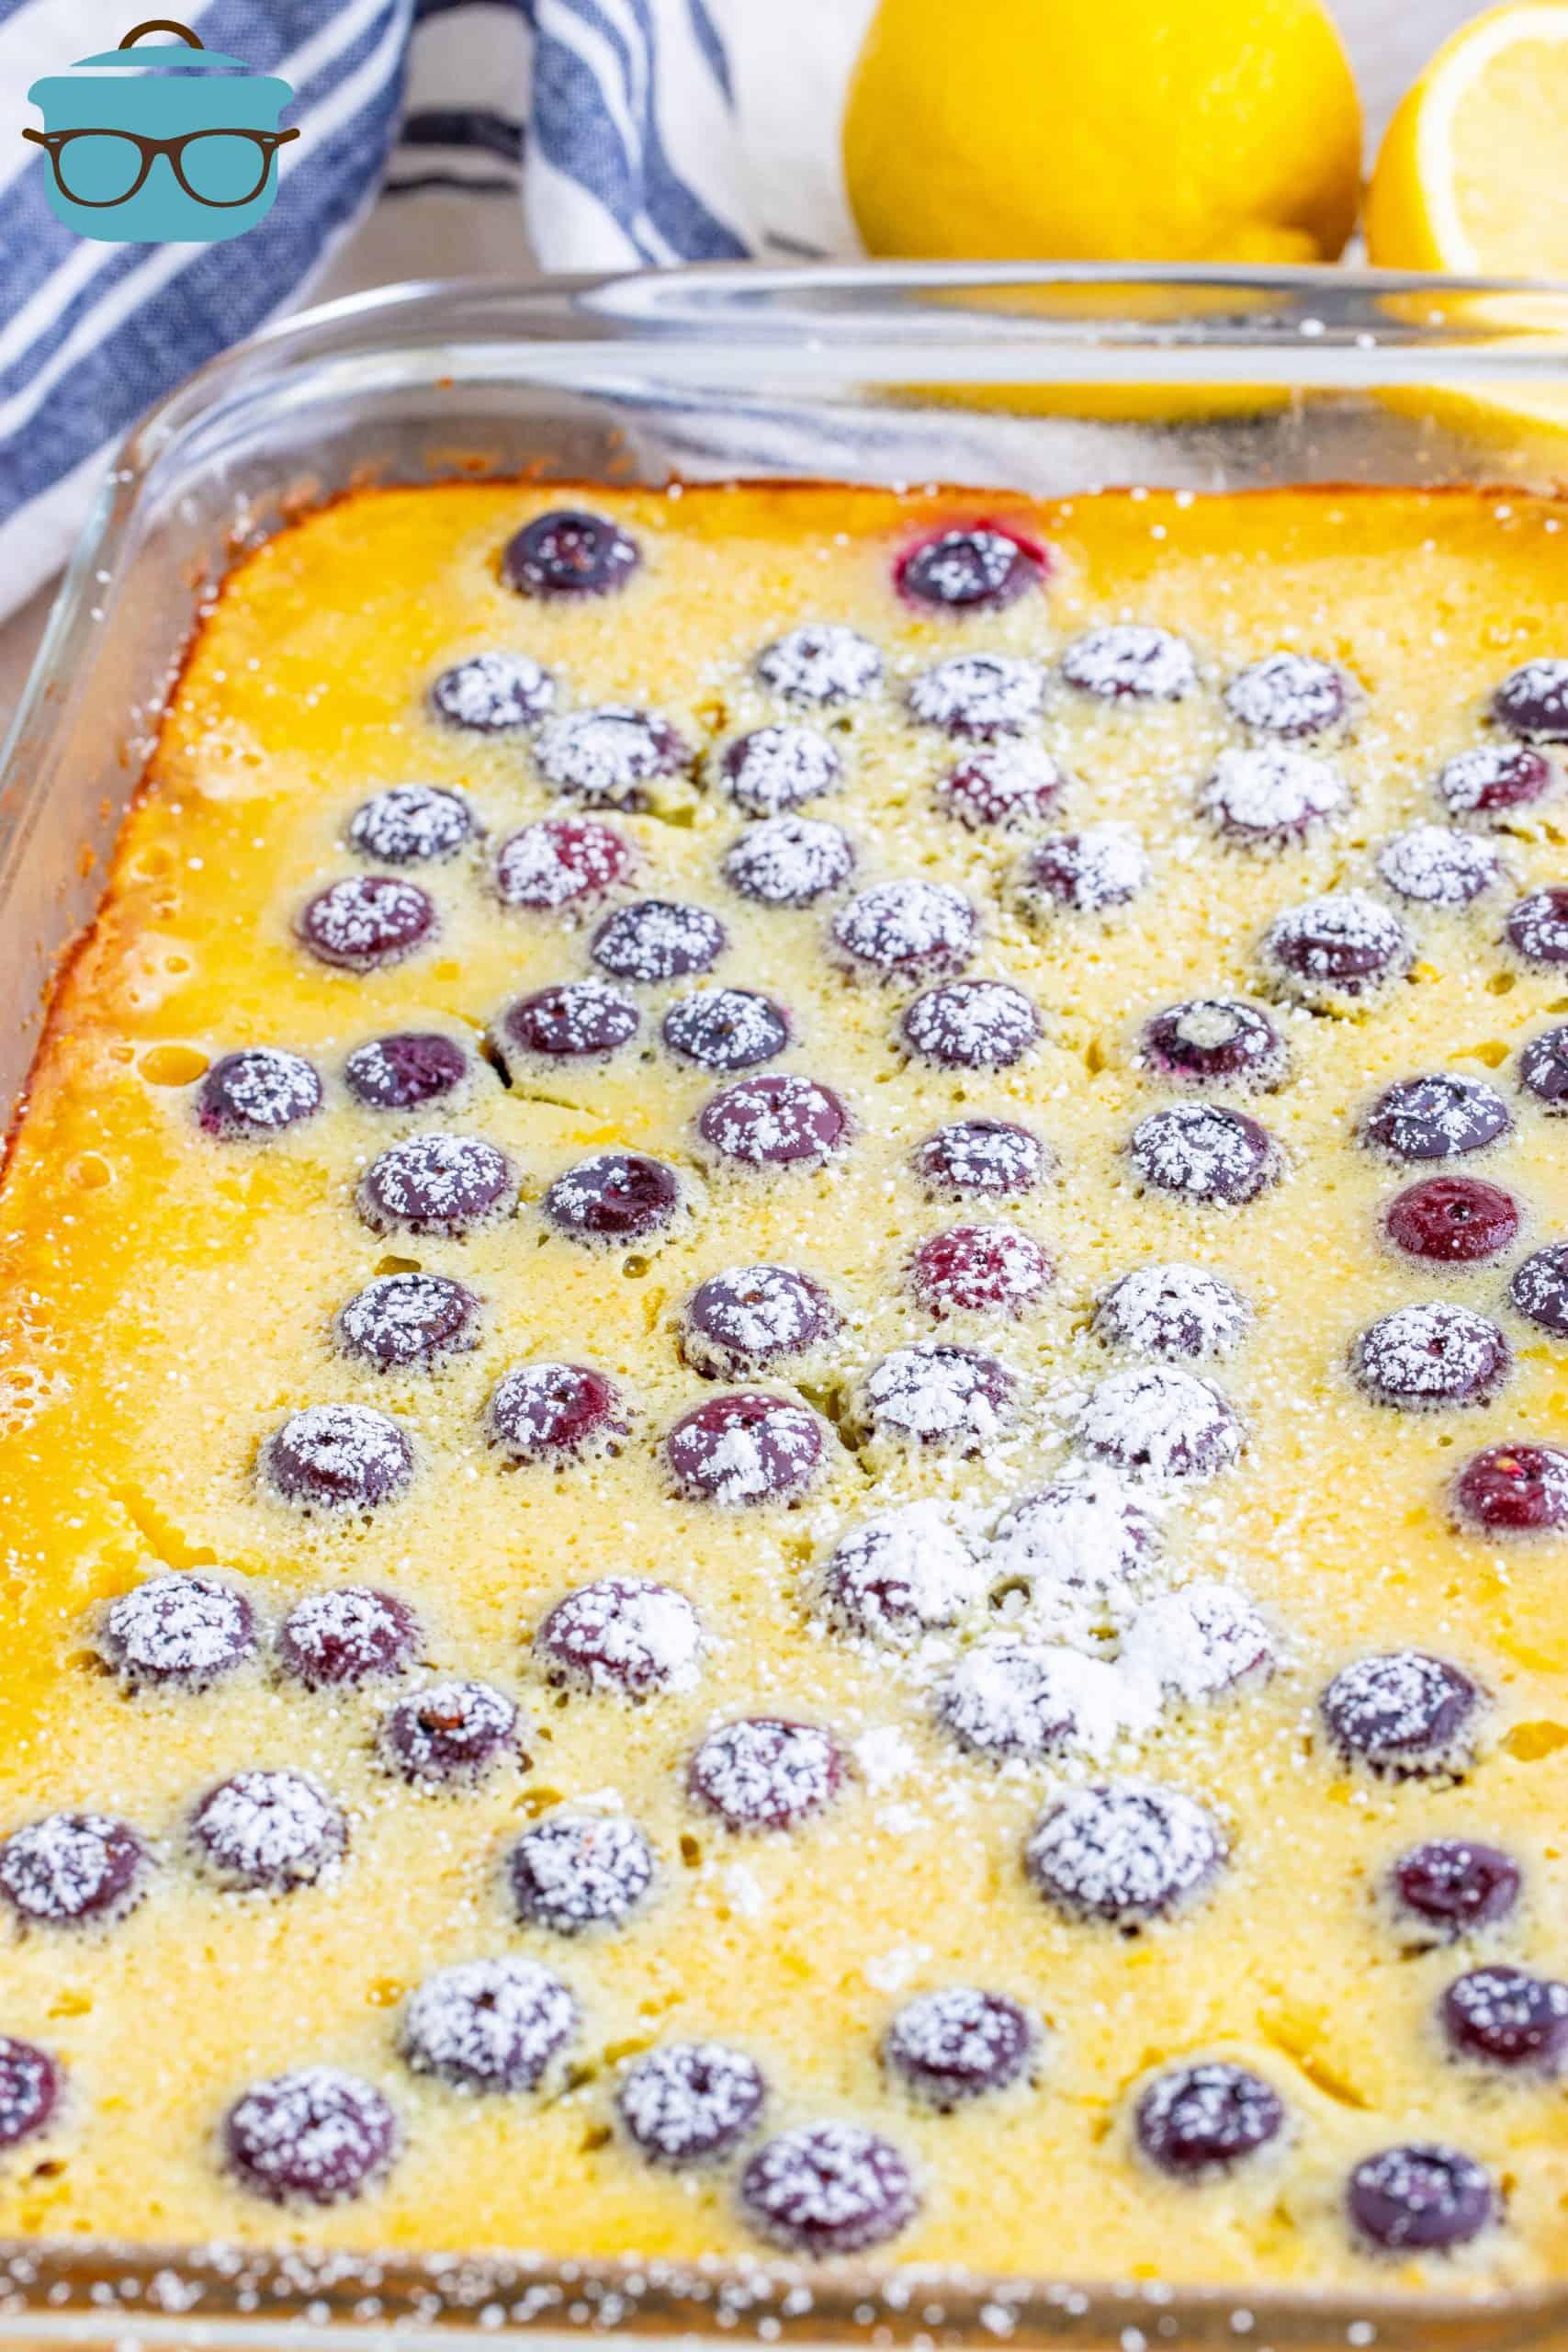 Baking dish with finished Blueberry Lemon Bars sprinkled with powdered sugar